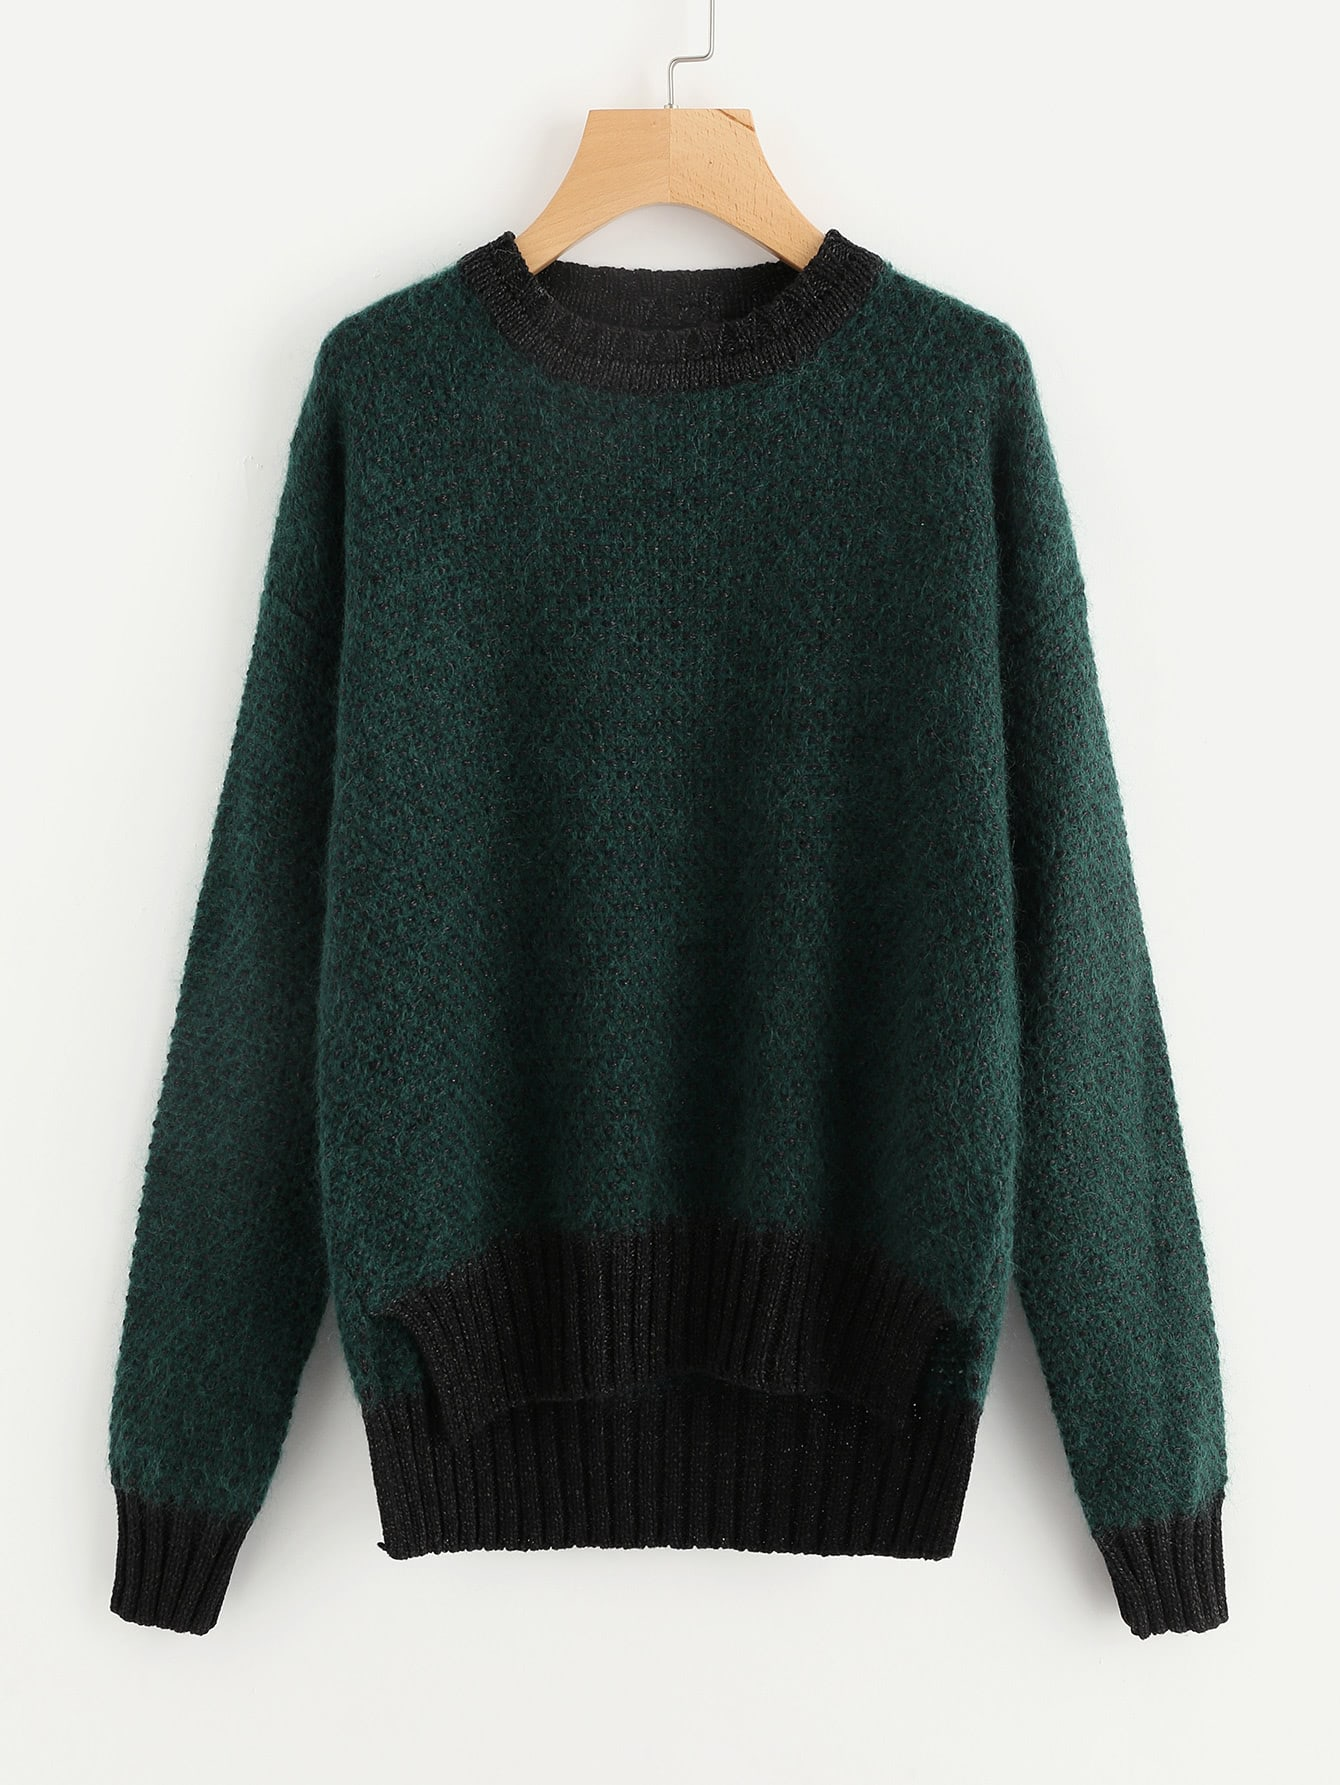 Contrast Trim Staggered Hem Fluffy Jumper sweater170904460